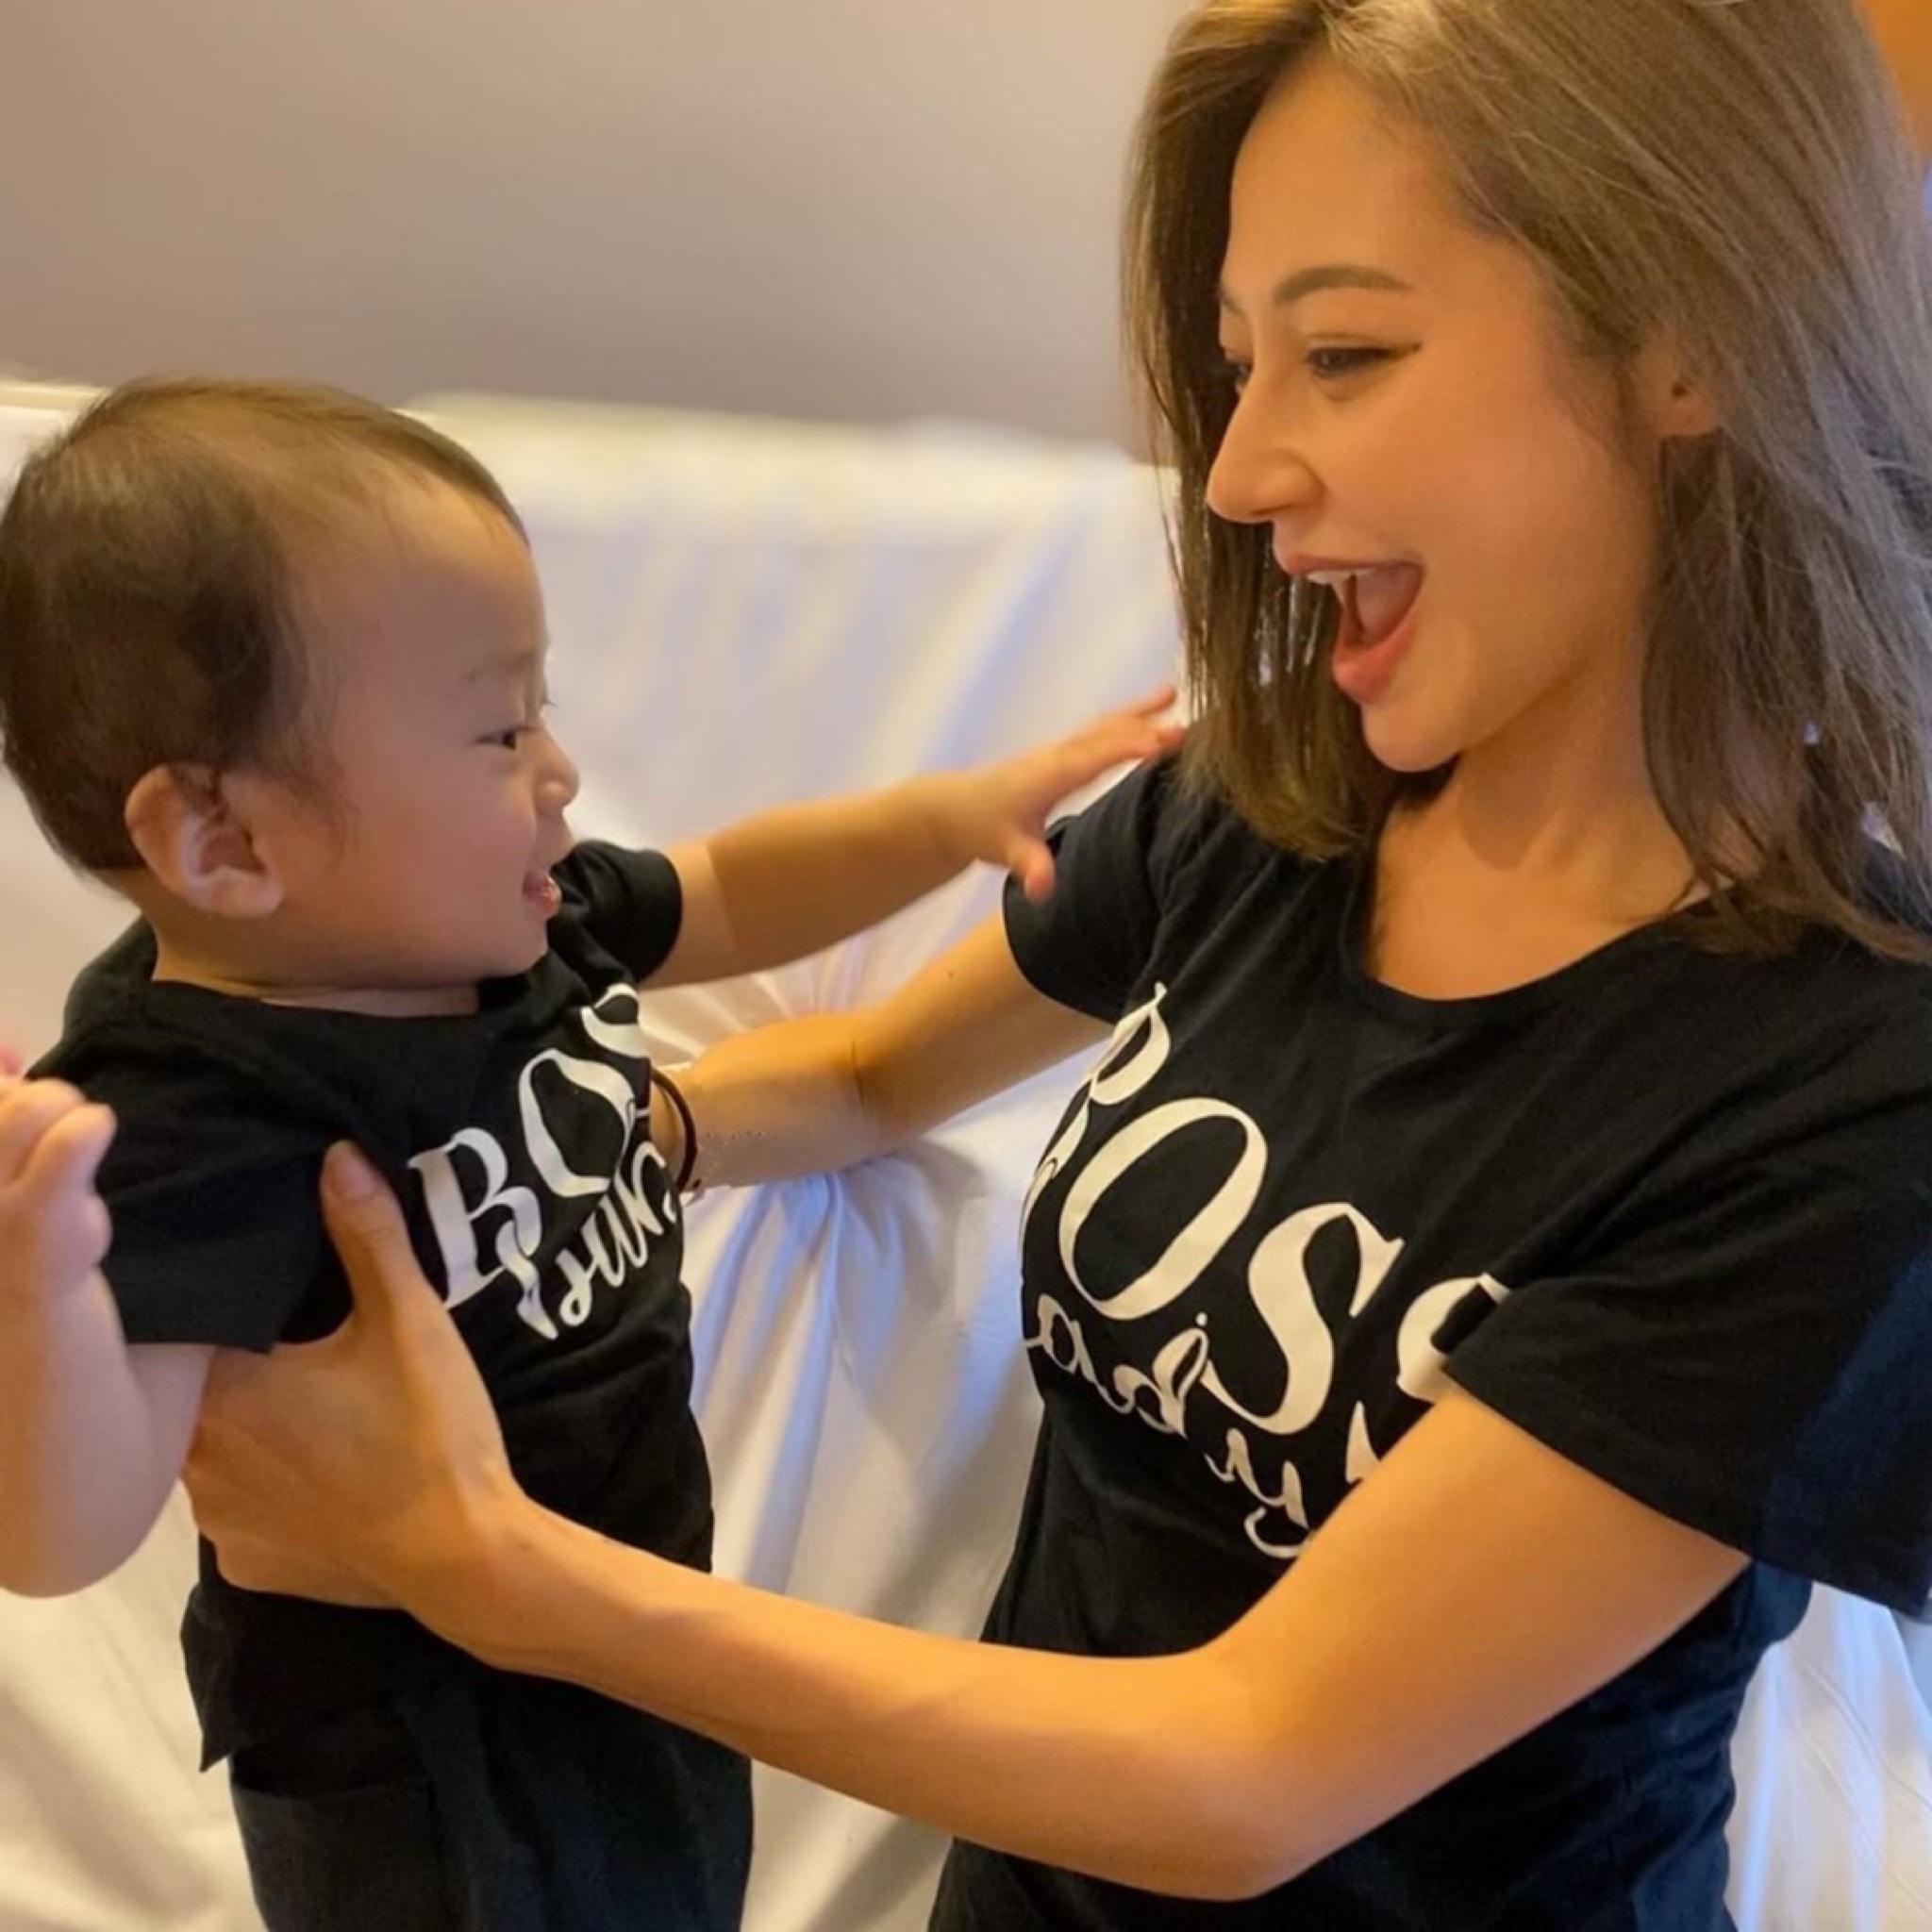 BOSS Lady &BOSS Baby親子ペアTシャツ/お揃い/80〜120/S〜XXL